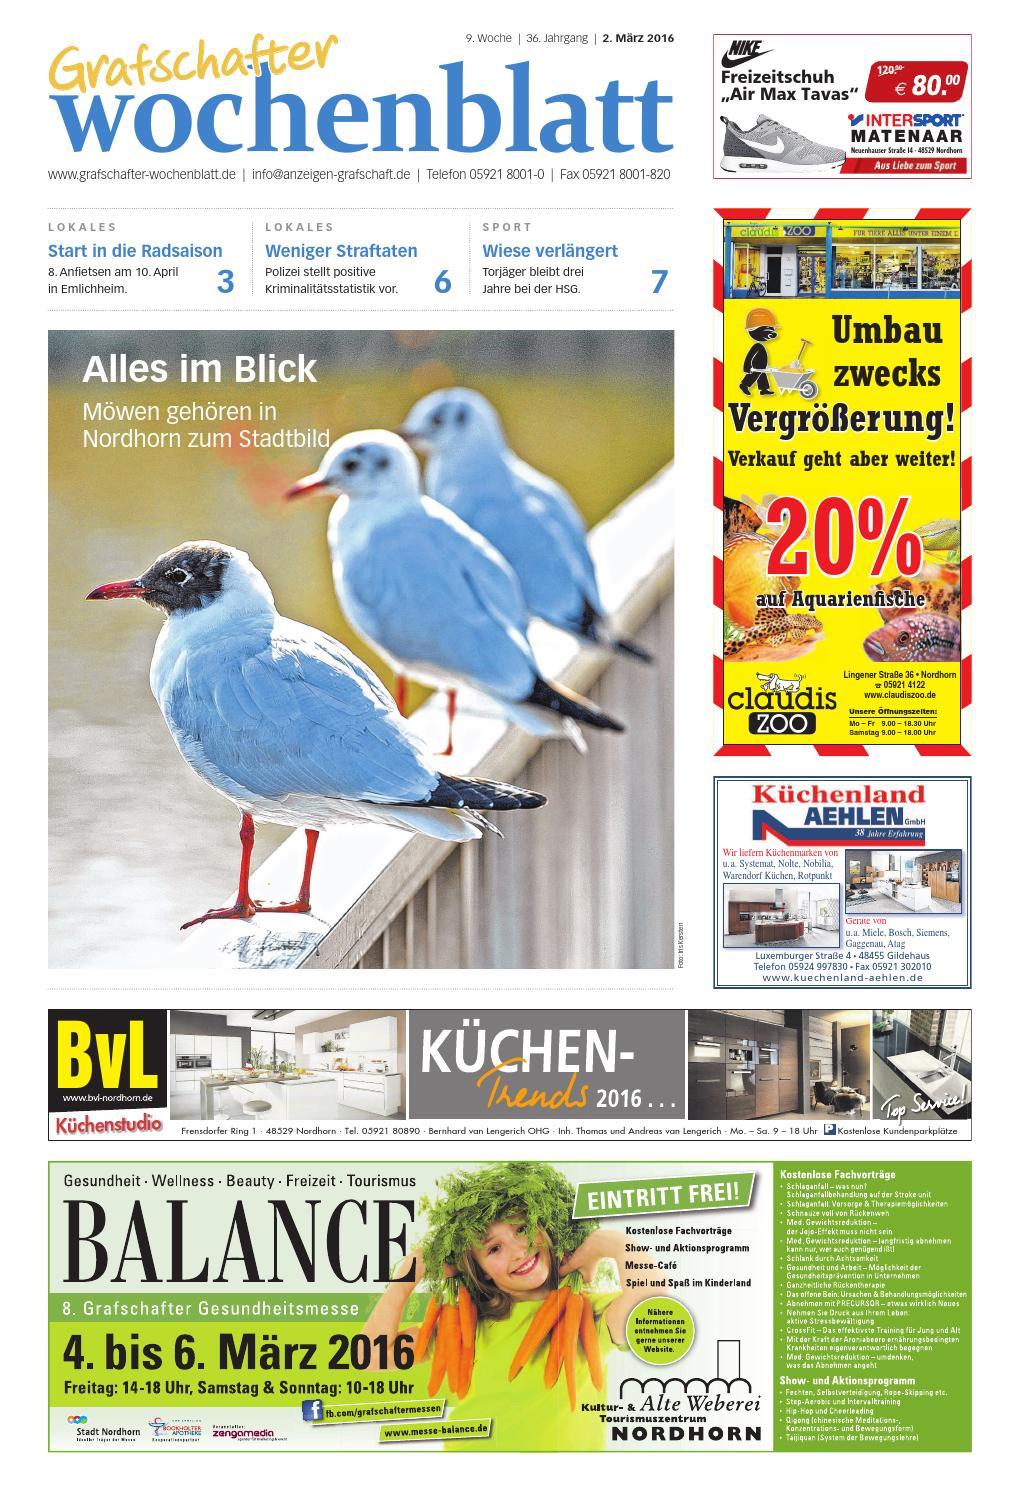 grafschafter wochenblatt 2 by sonntagszeitung issuu. Black Bedroom Furniture Sets. Home Design Ideas